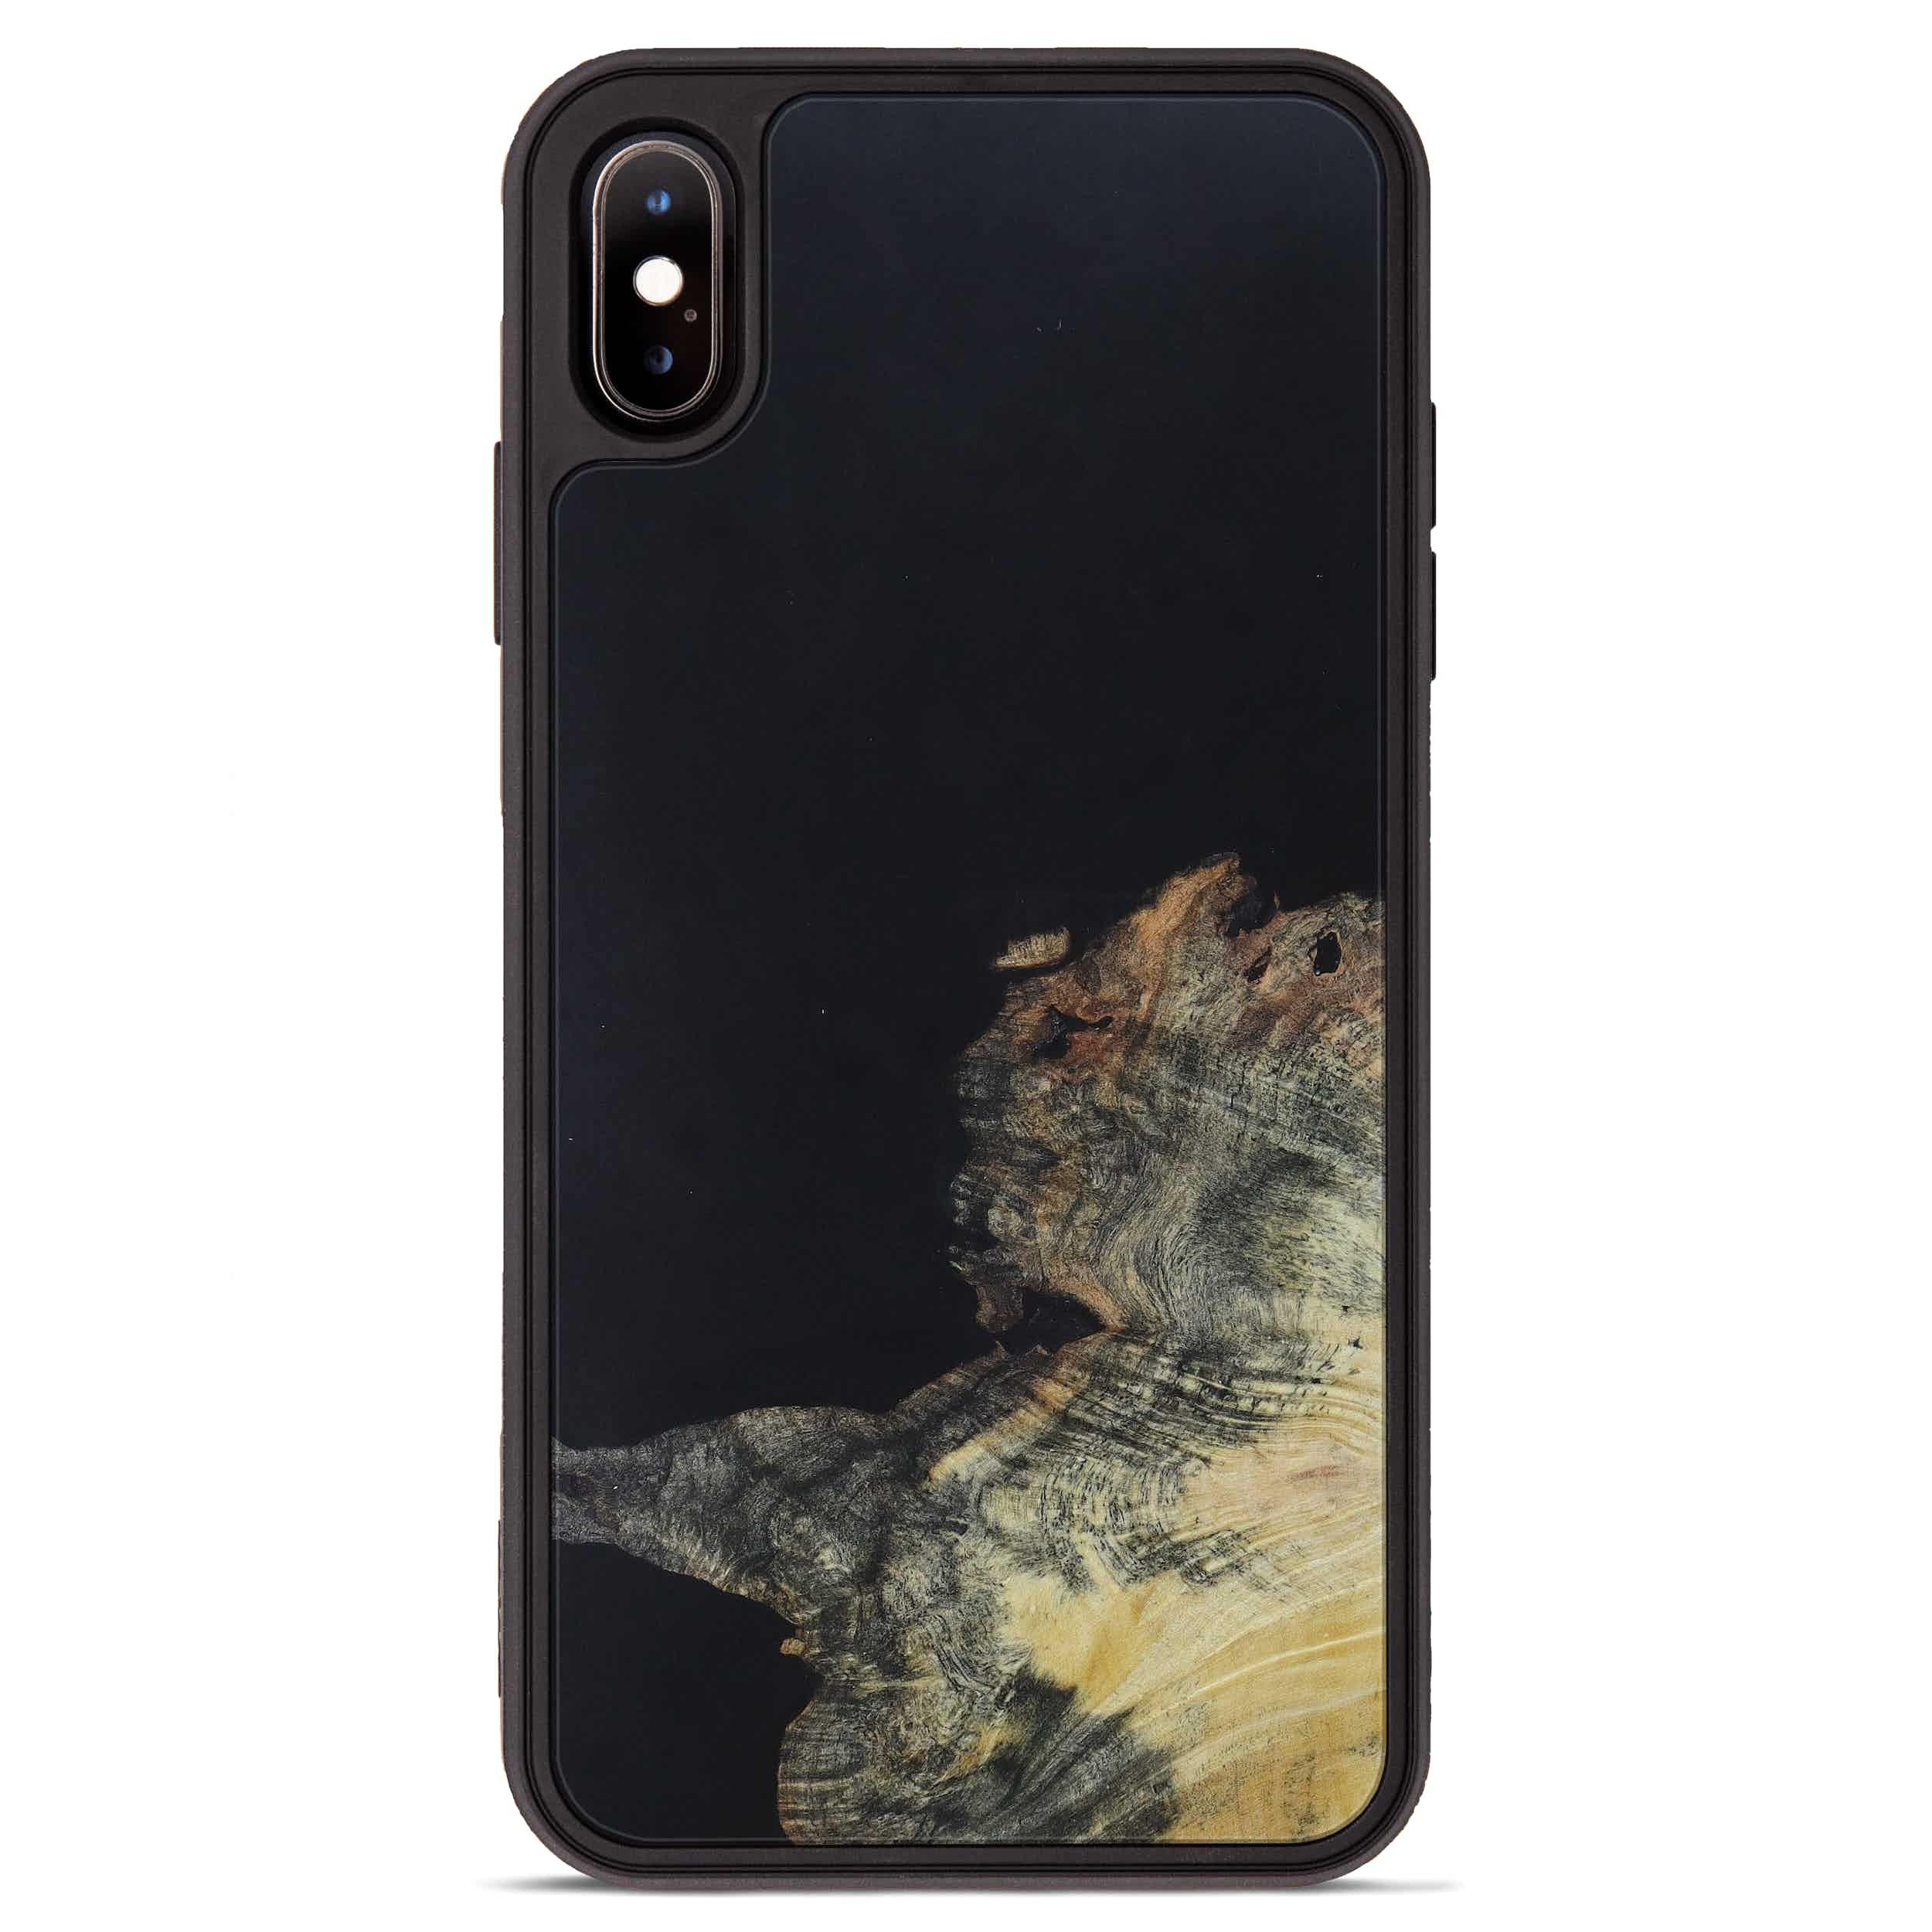 iPhone Xs Max Wood+Resin Phone Case - Arne (Pure Black, 395150)